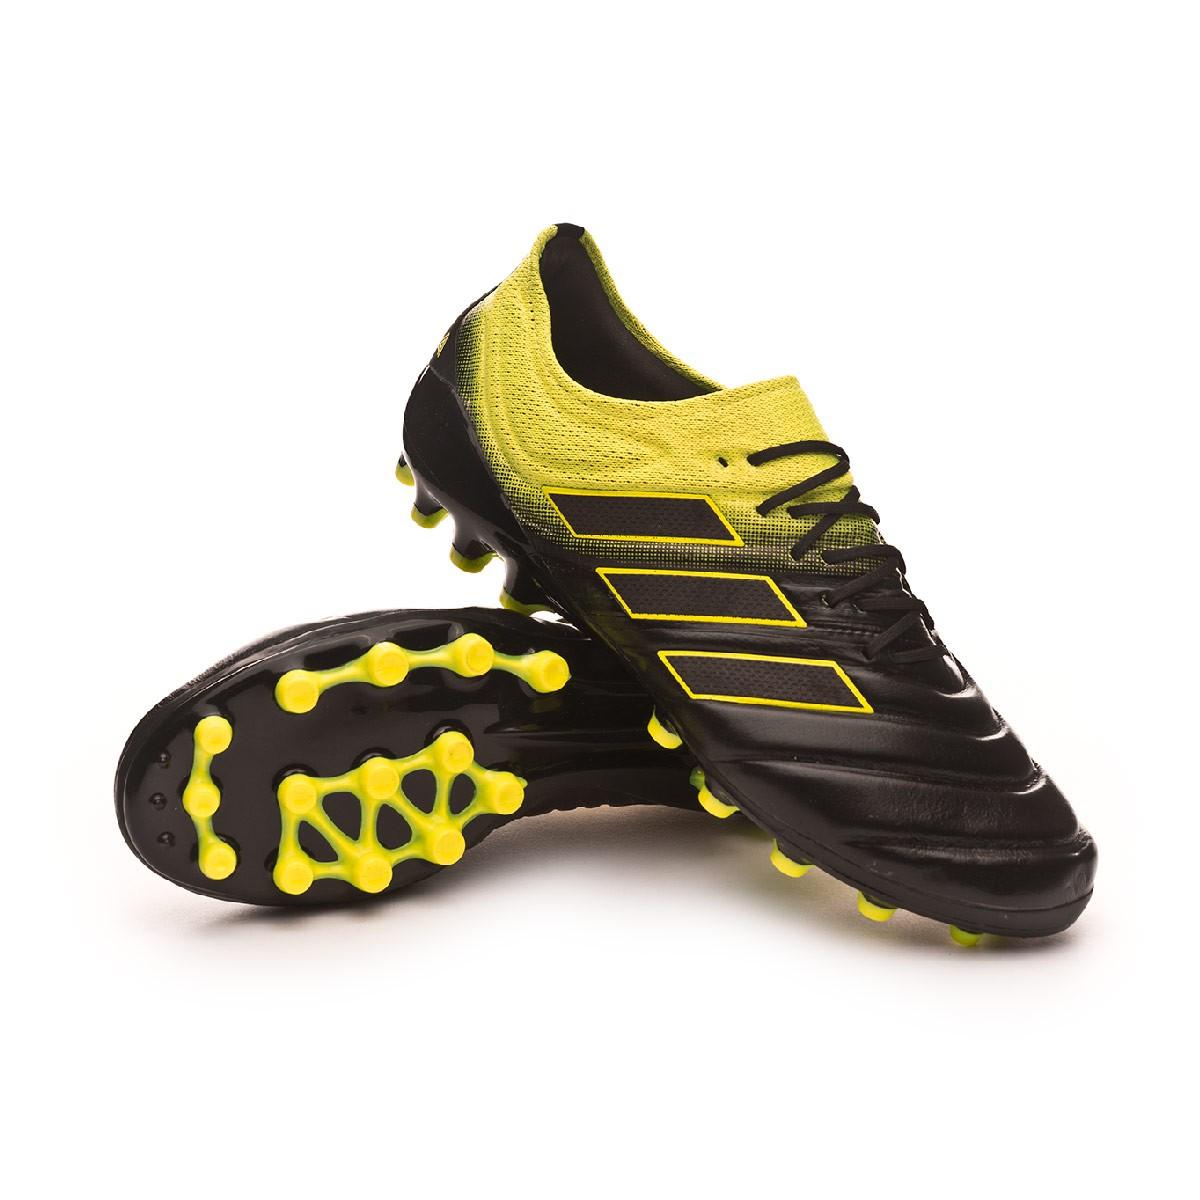 half off 02afd 3ecef Boot adidas Copa 19.1 AG Core black-Solar yellow-Core black